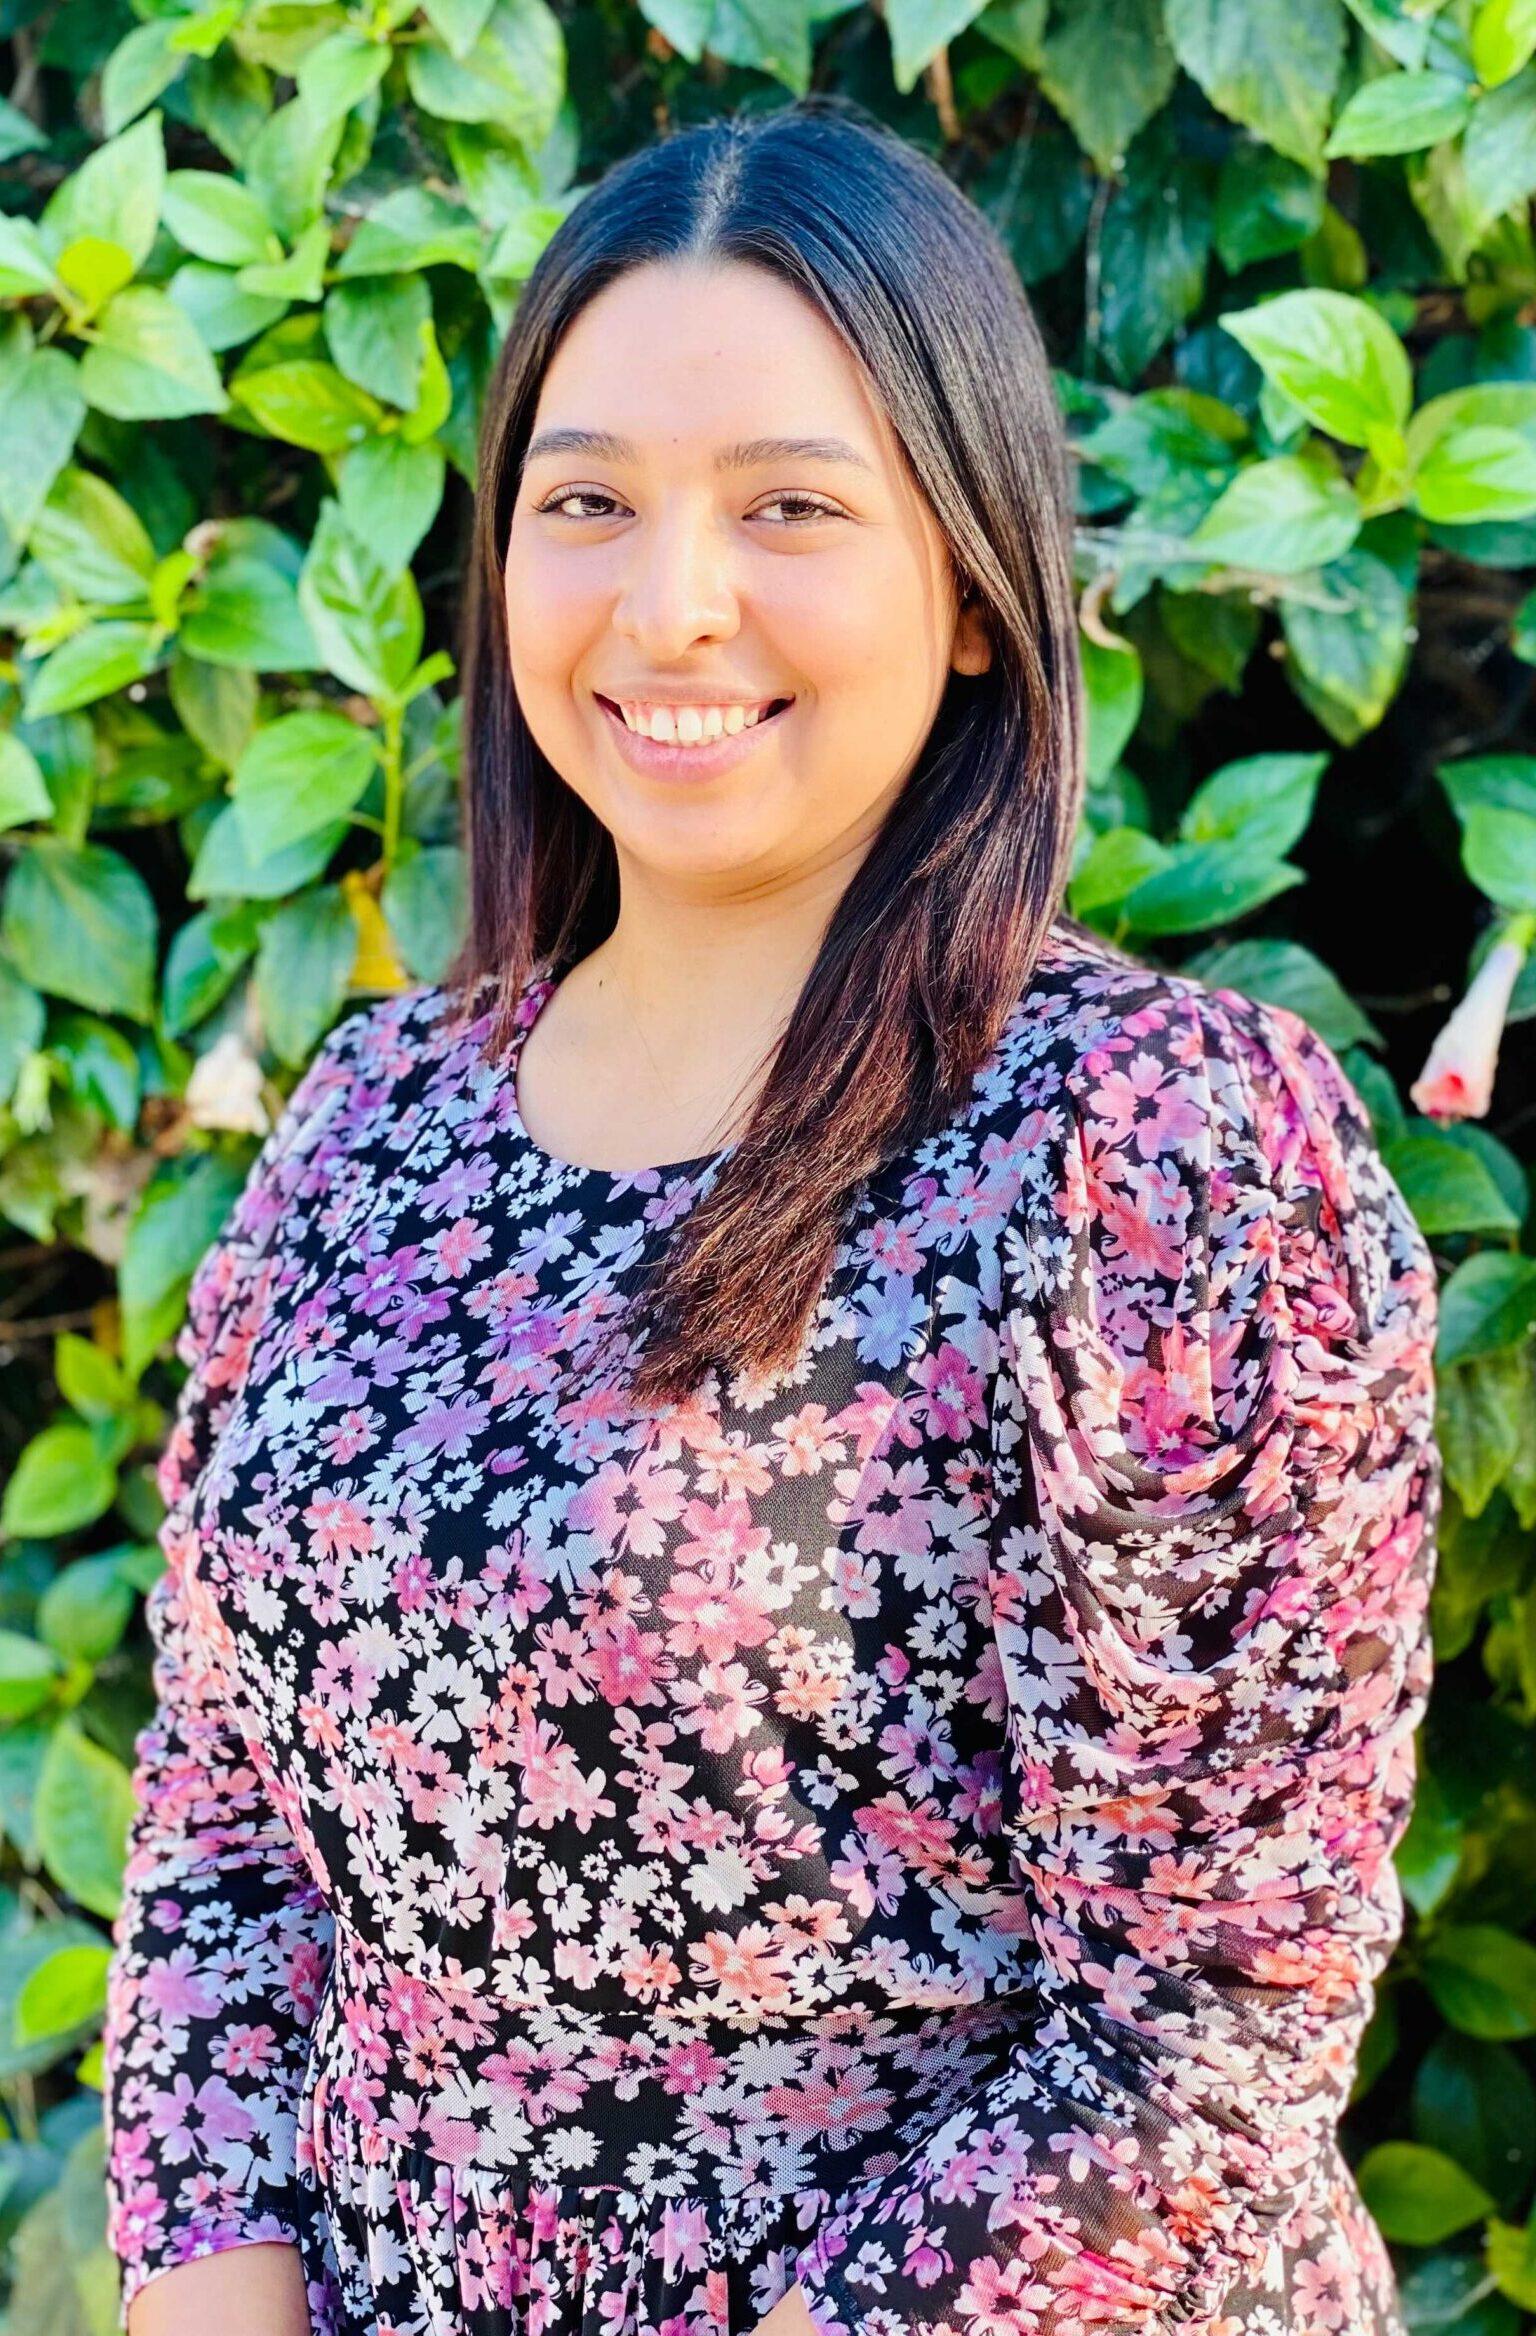 Abogado de Immigracion 714-541-4100 - Michelle Rosales